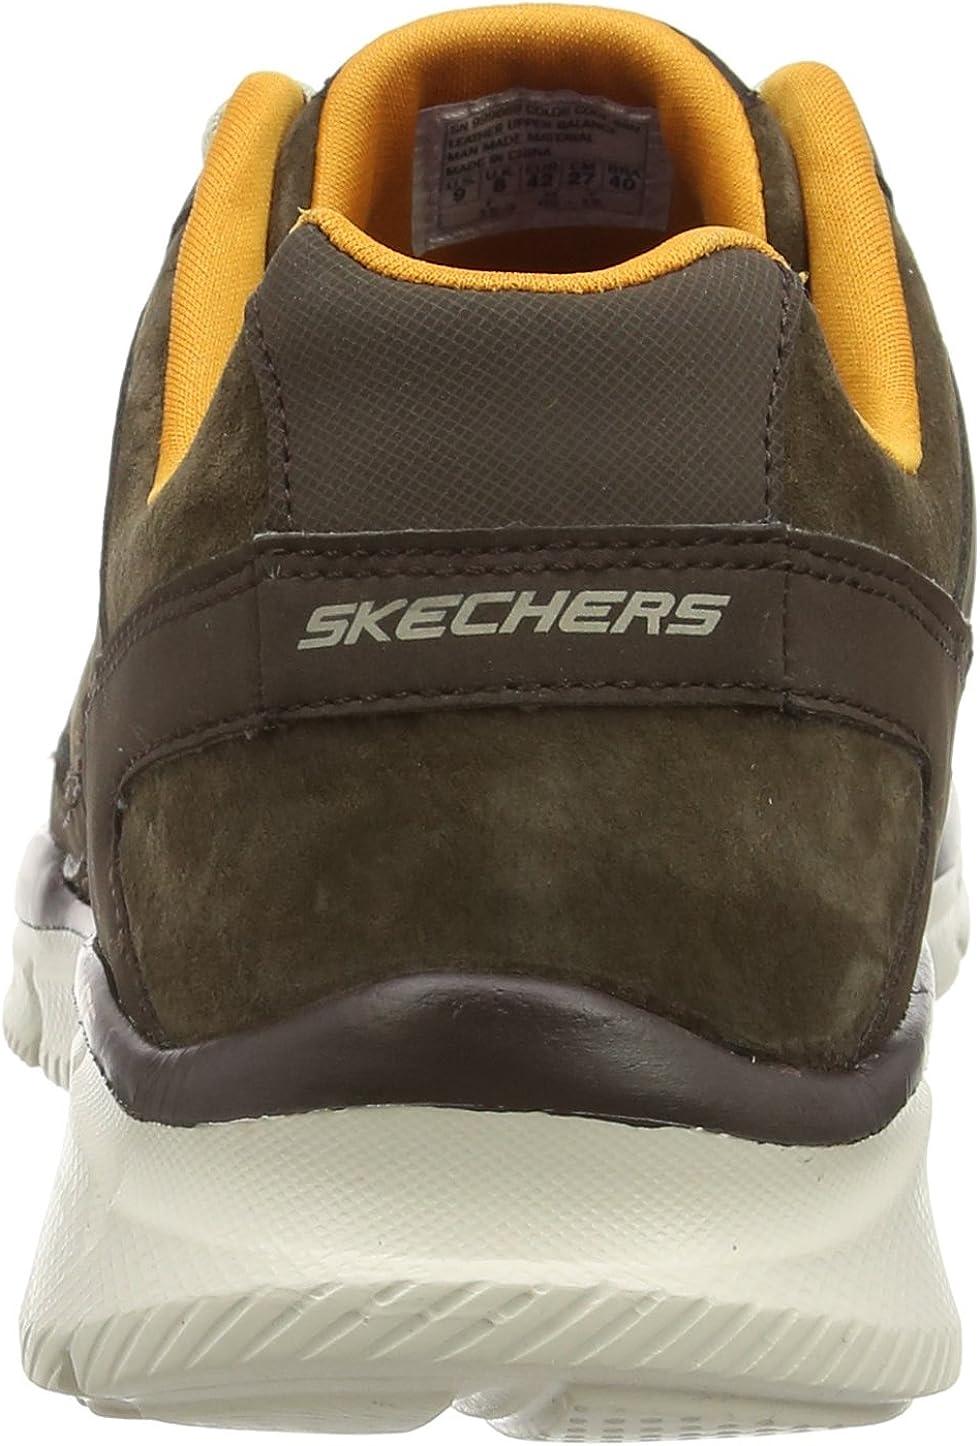 skechers equalizer timepiece